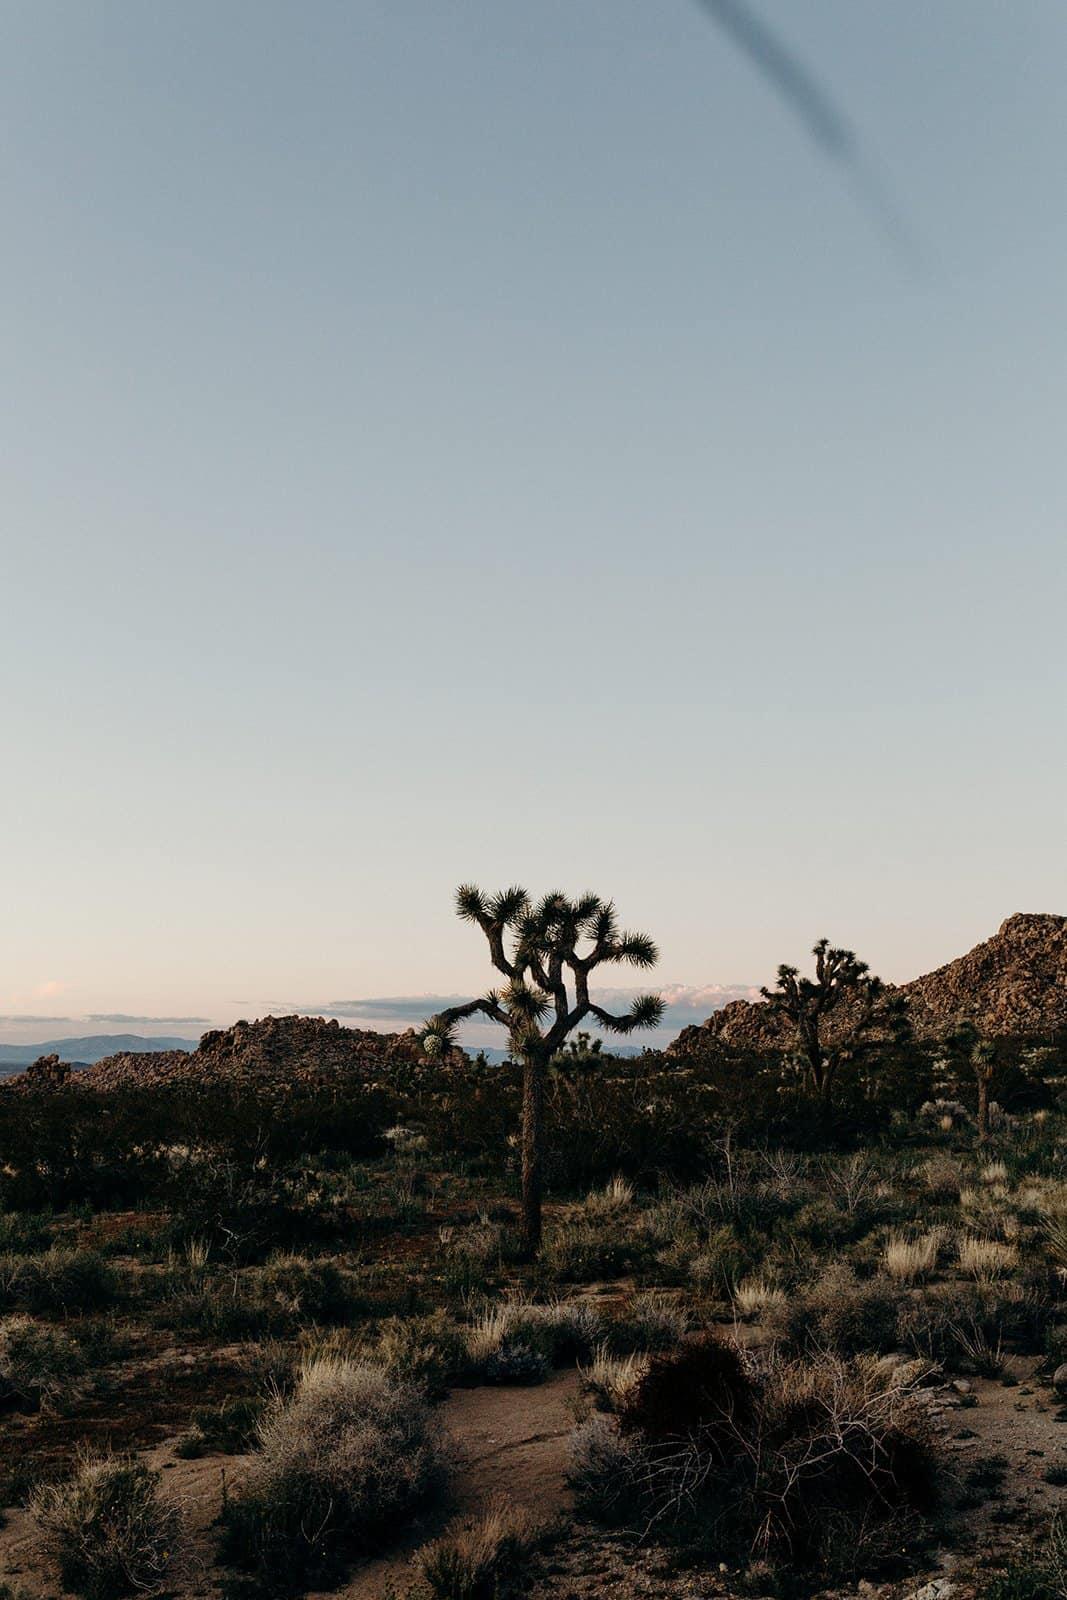 Sunset on joshua tree in Joshua Tree National Park